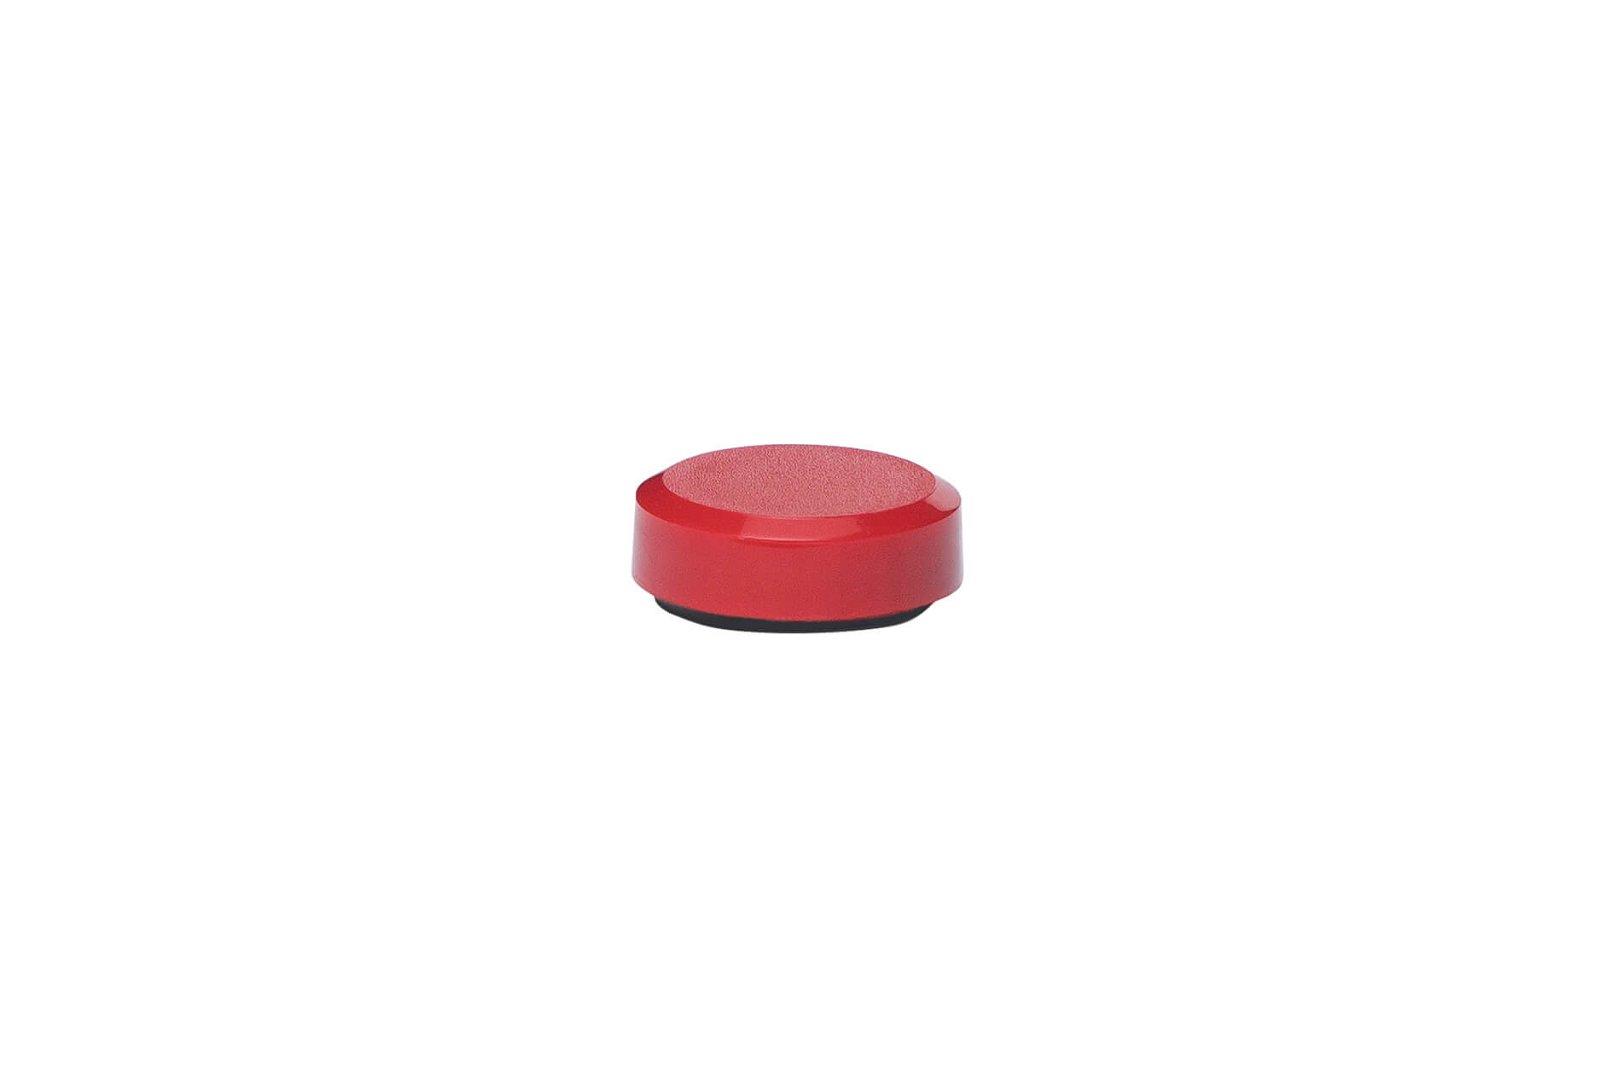 Facetterand-Magnet MAULpro Ø 20 mm, 0,3 kg, 20 St./Set, rot